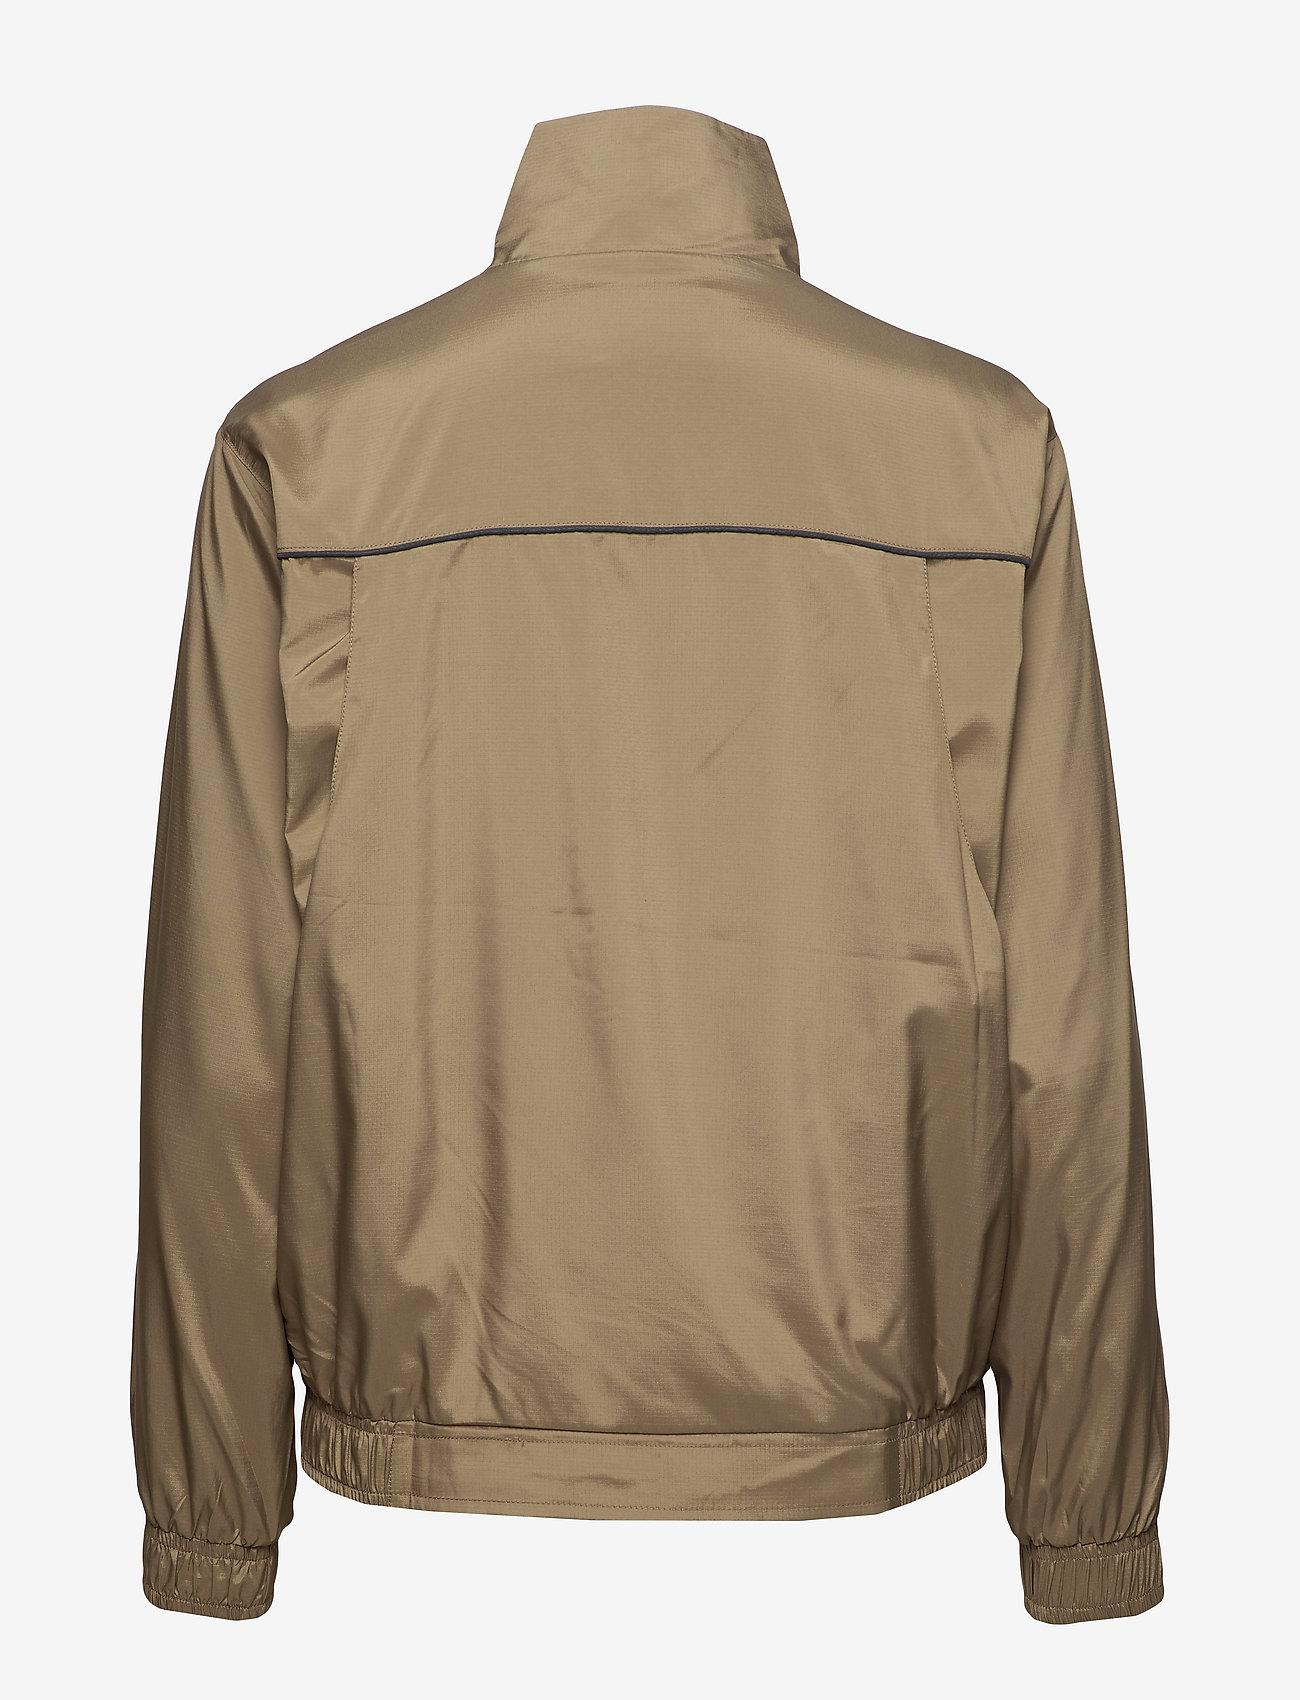 Engreen Jacket 6707 (Capers) (474.50 kr) Envii  